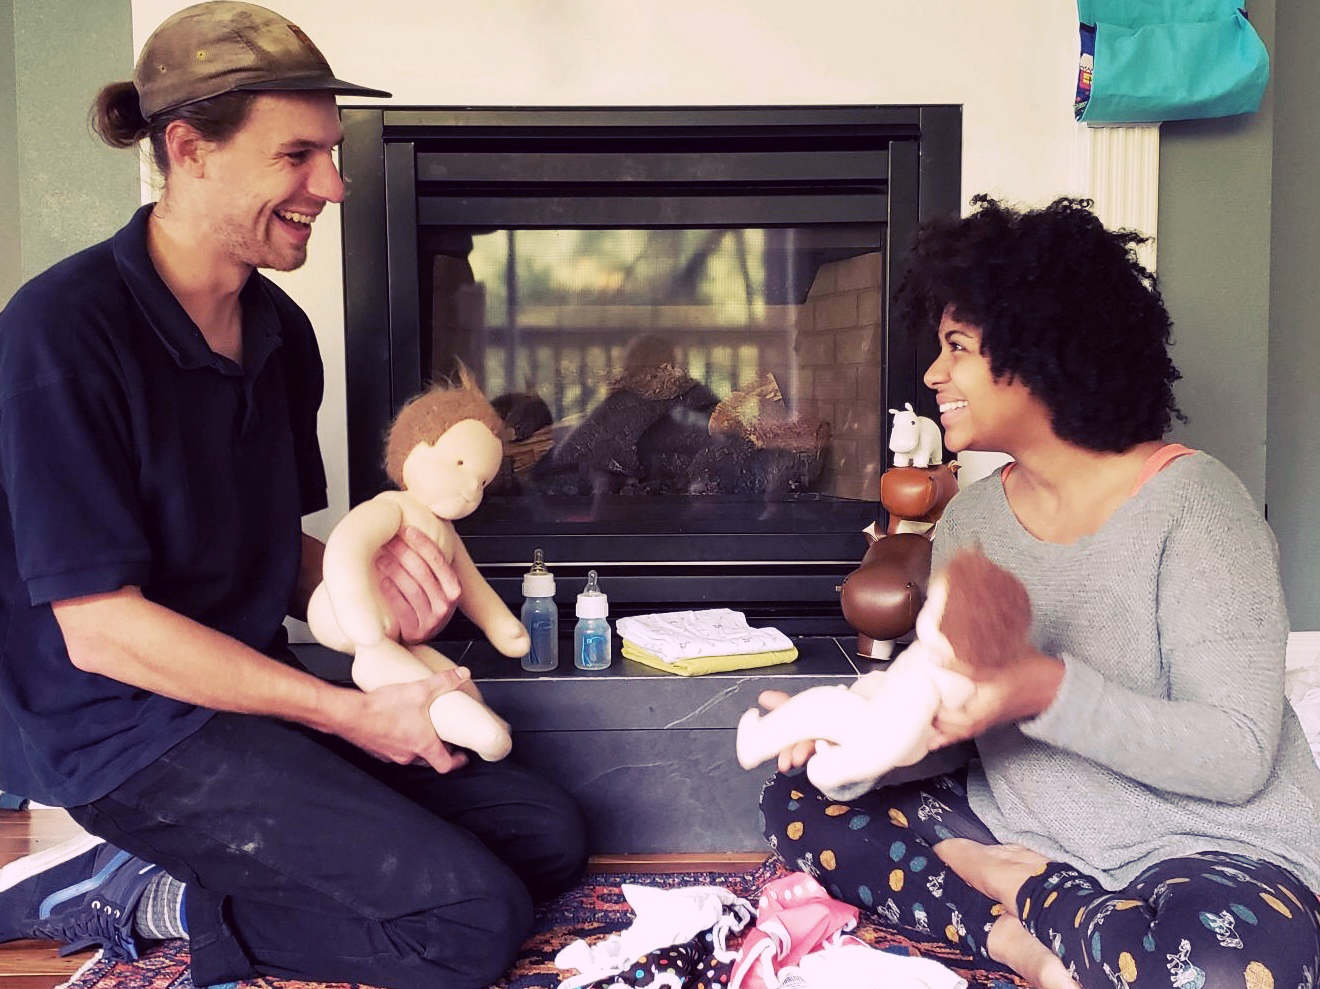 newborn care essentials.jpg